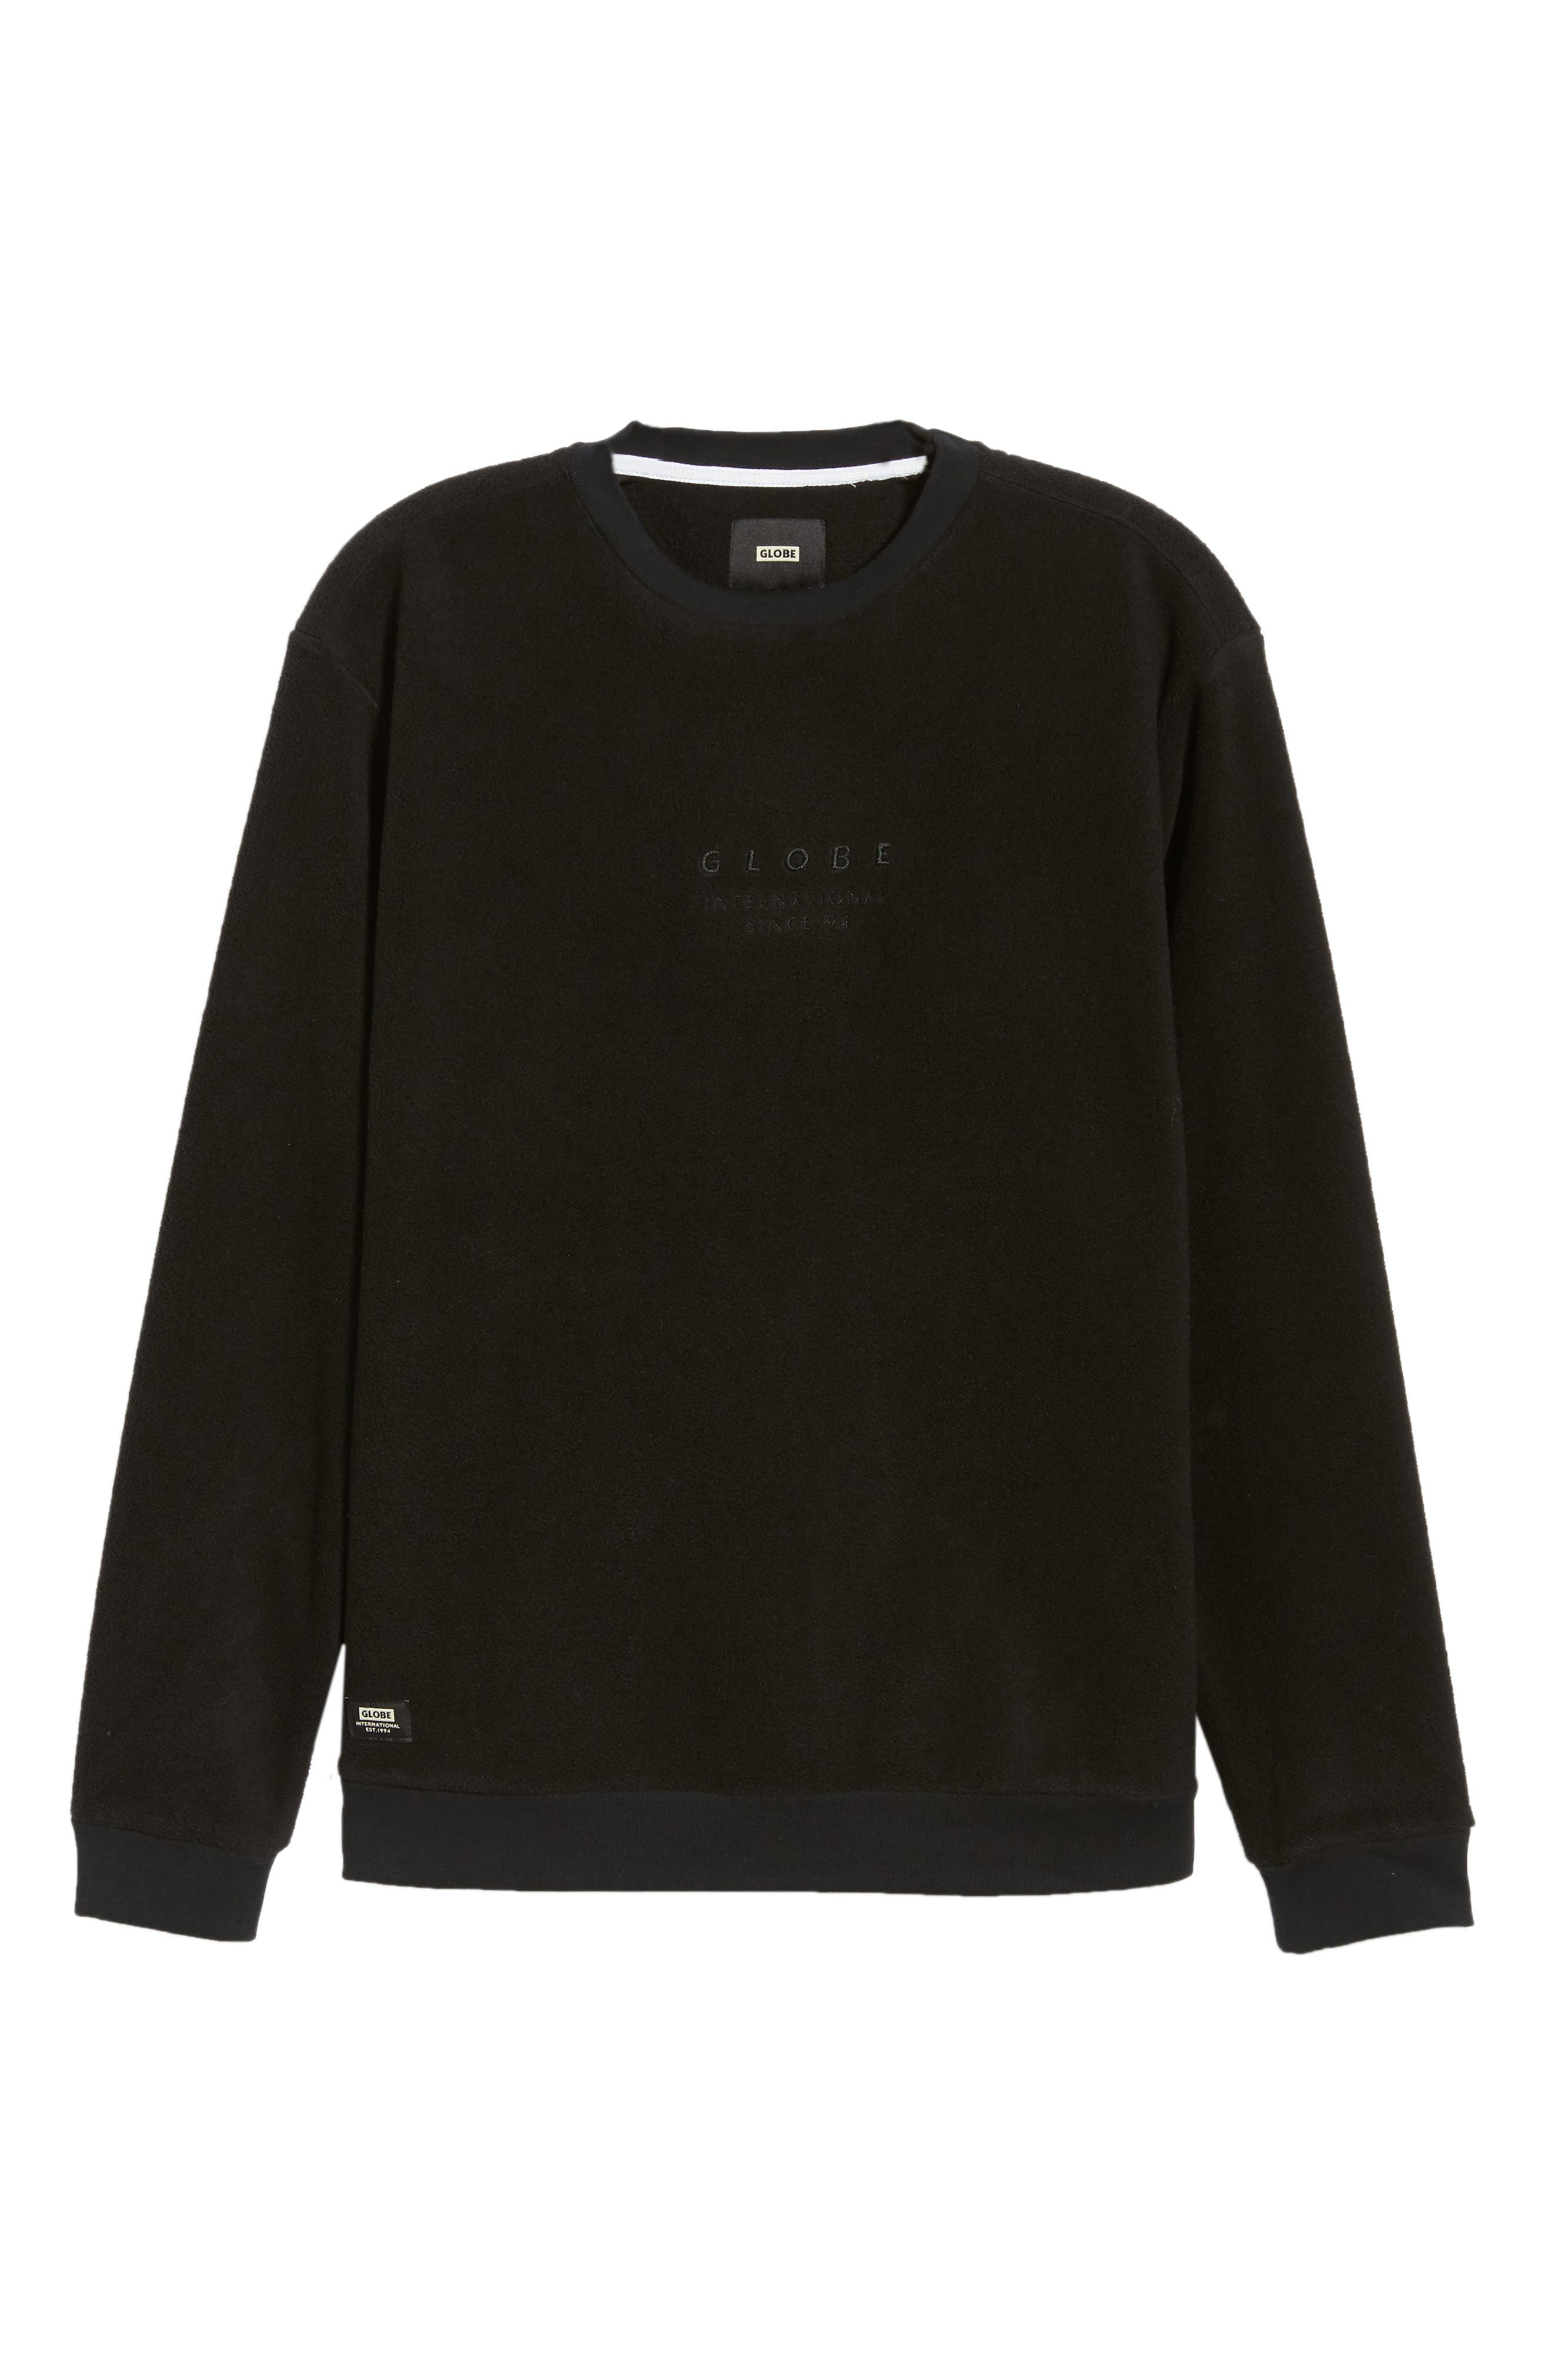 State Sweatshirt,                             Alternate thumbnail 6, color,                             BLACK